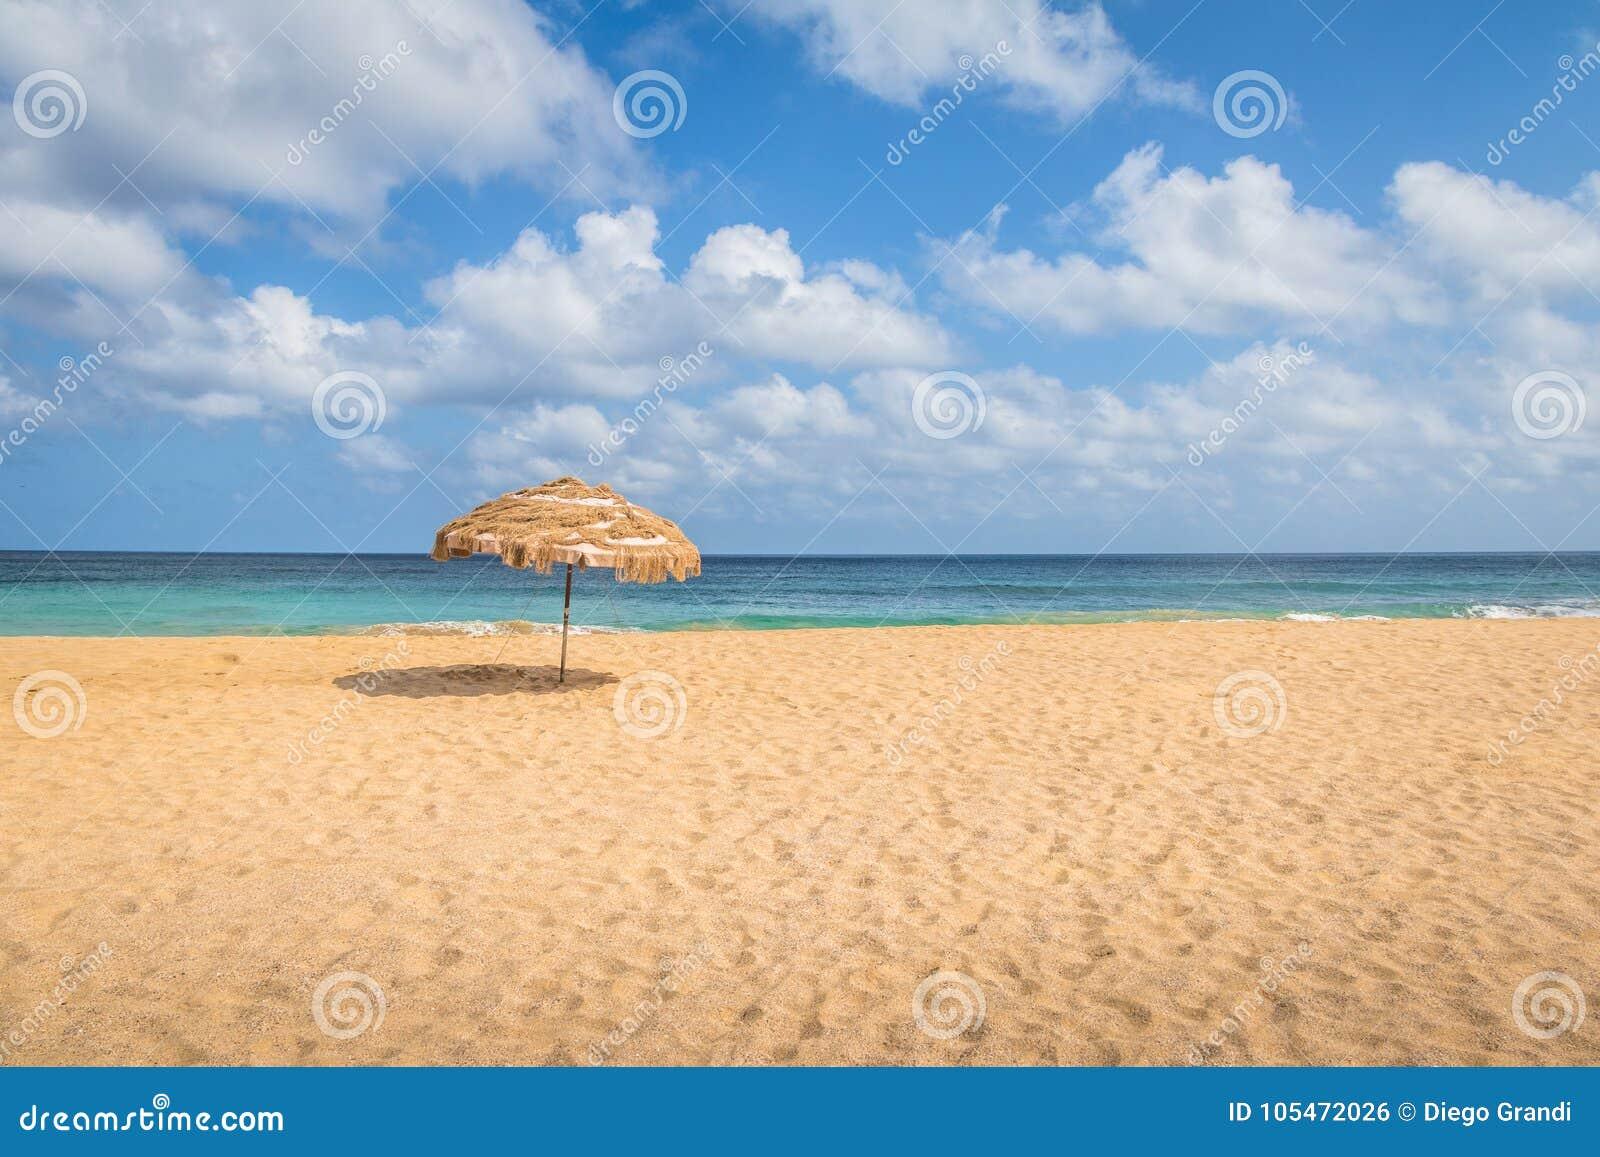 Strandparaplu en Tropische Turkooise Overzees in Cacimba do Padre Beach - Fernando de Noronha, Pernambuco, Brazilië